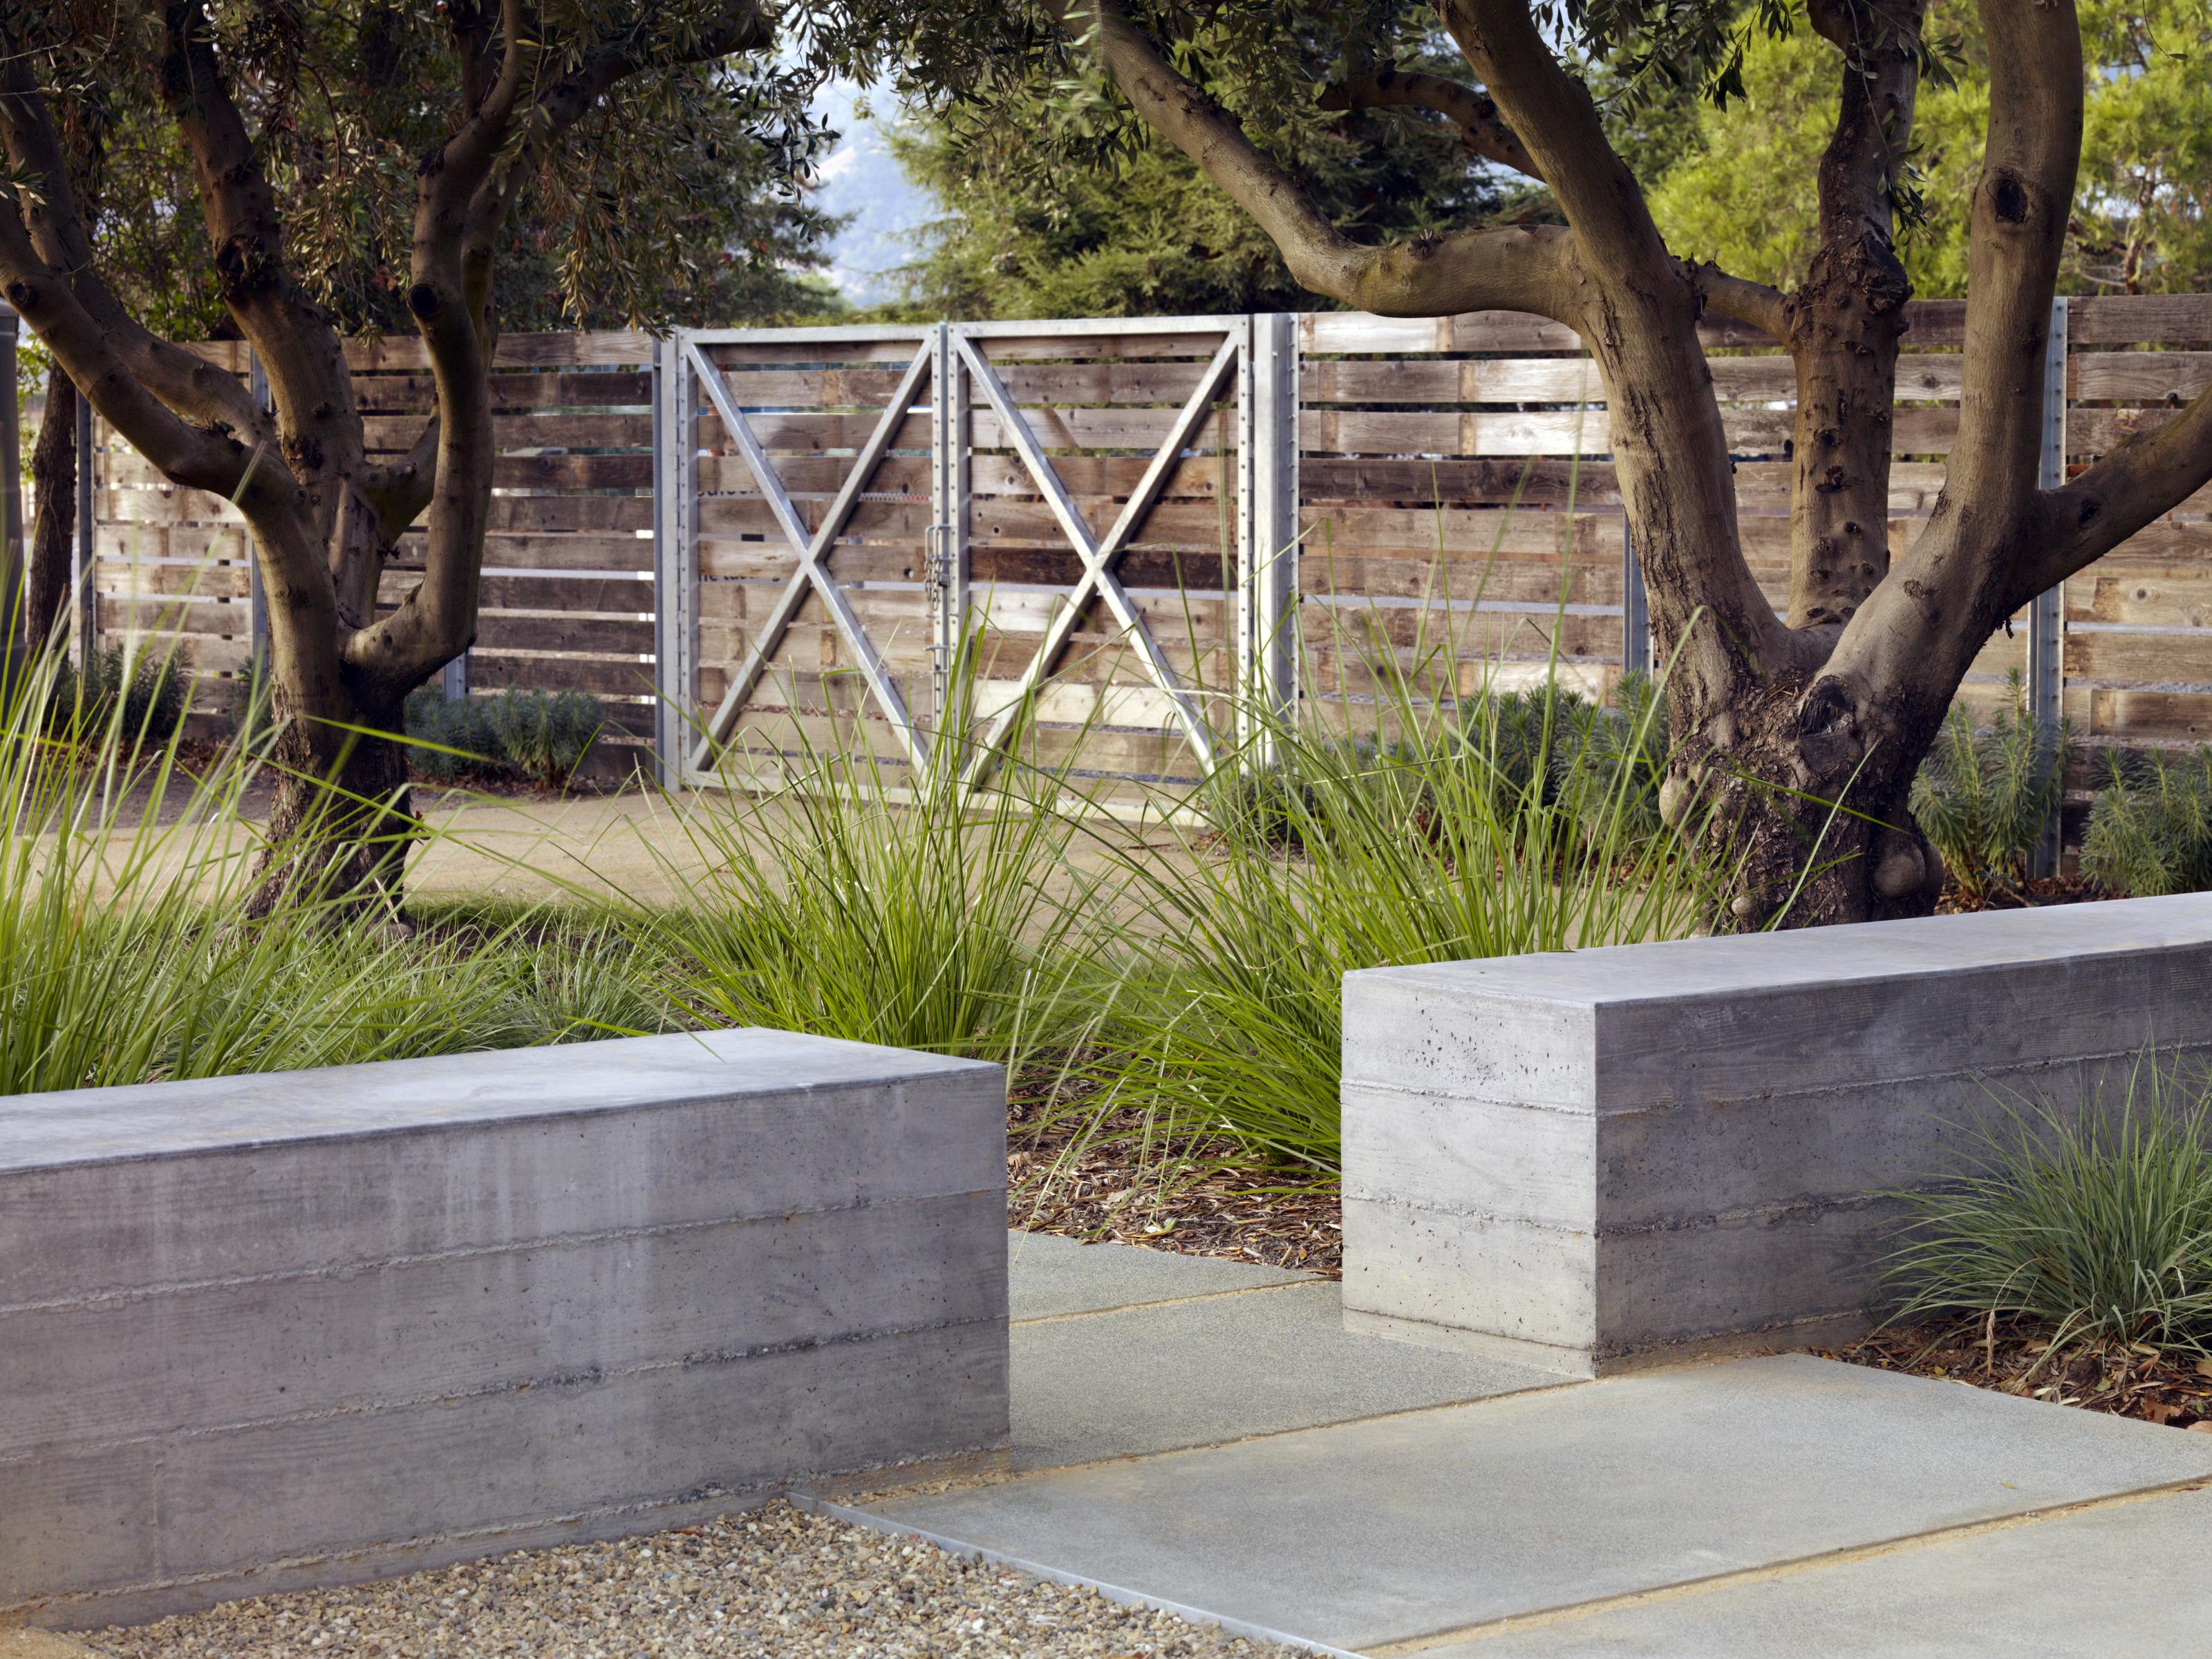 Asla 2013 professional awards medlock ames tasting room for Form garden architecture